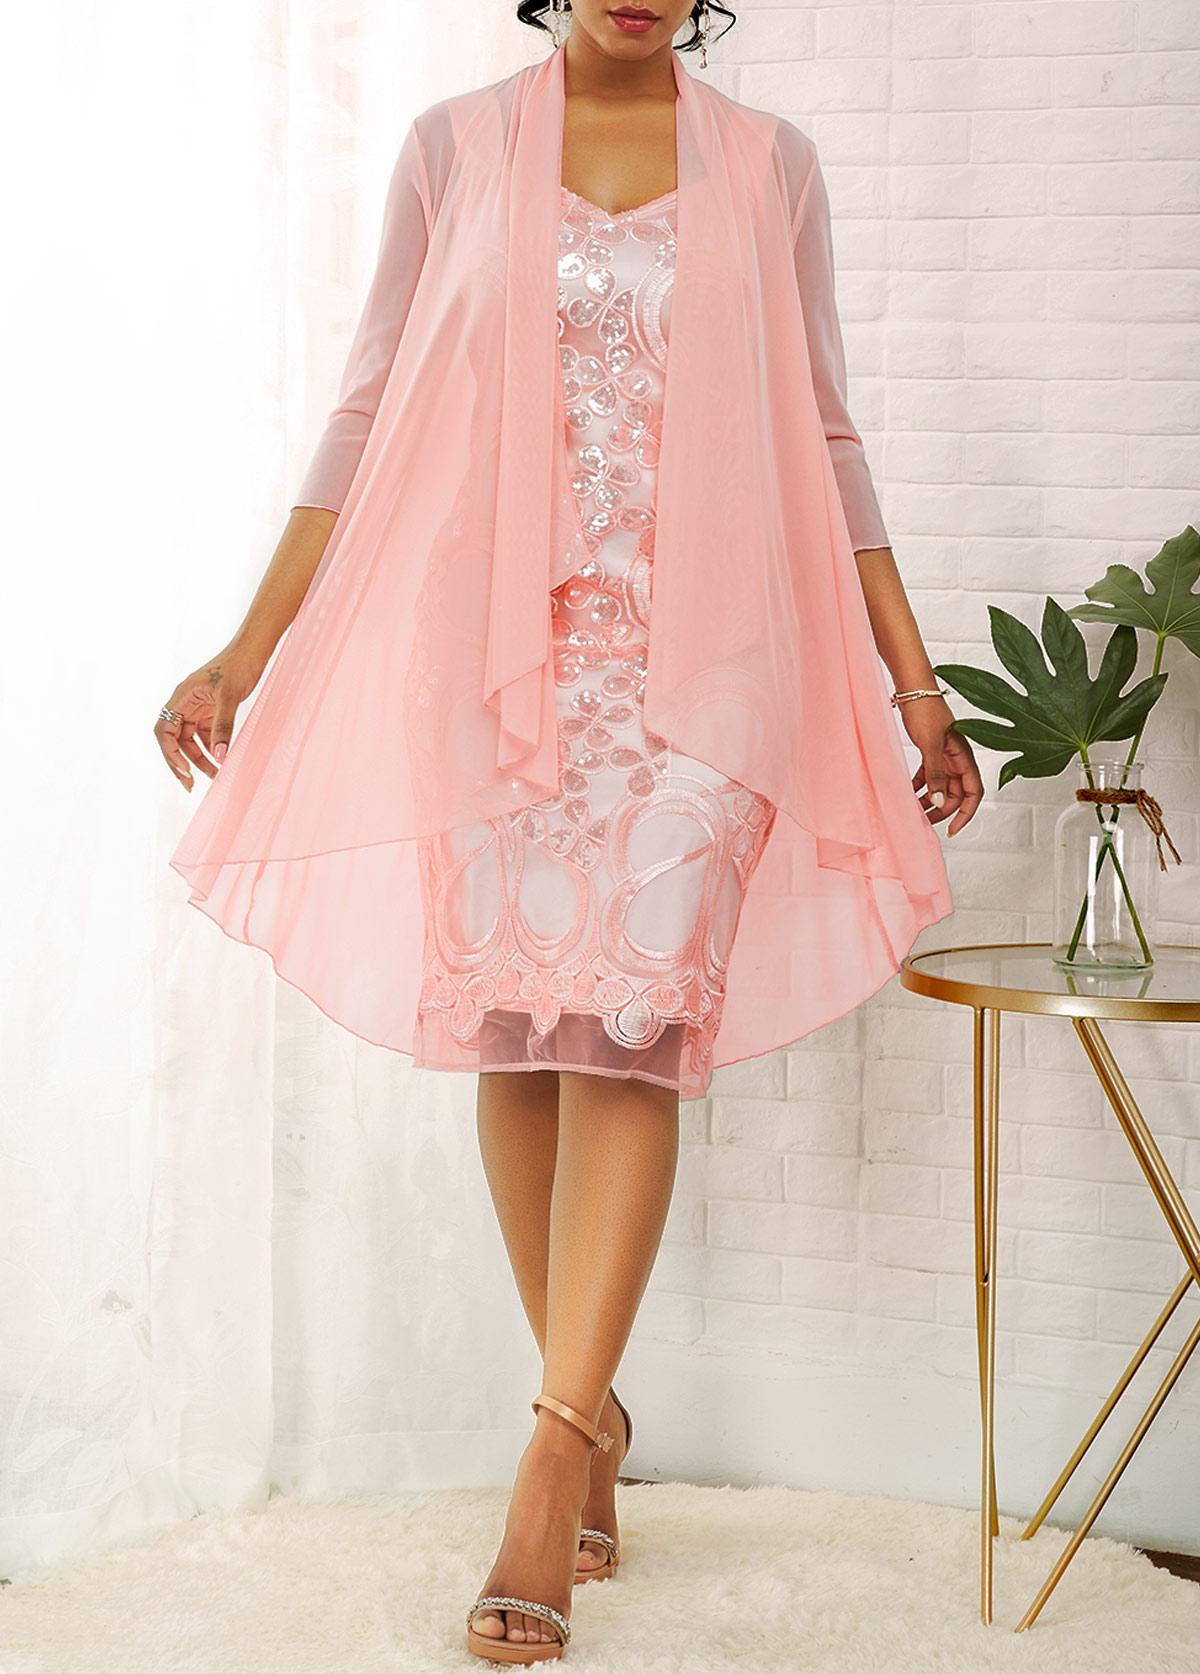 ROTITA Solid Cardigan and Glitter Fabric Stitching Dress